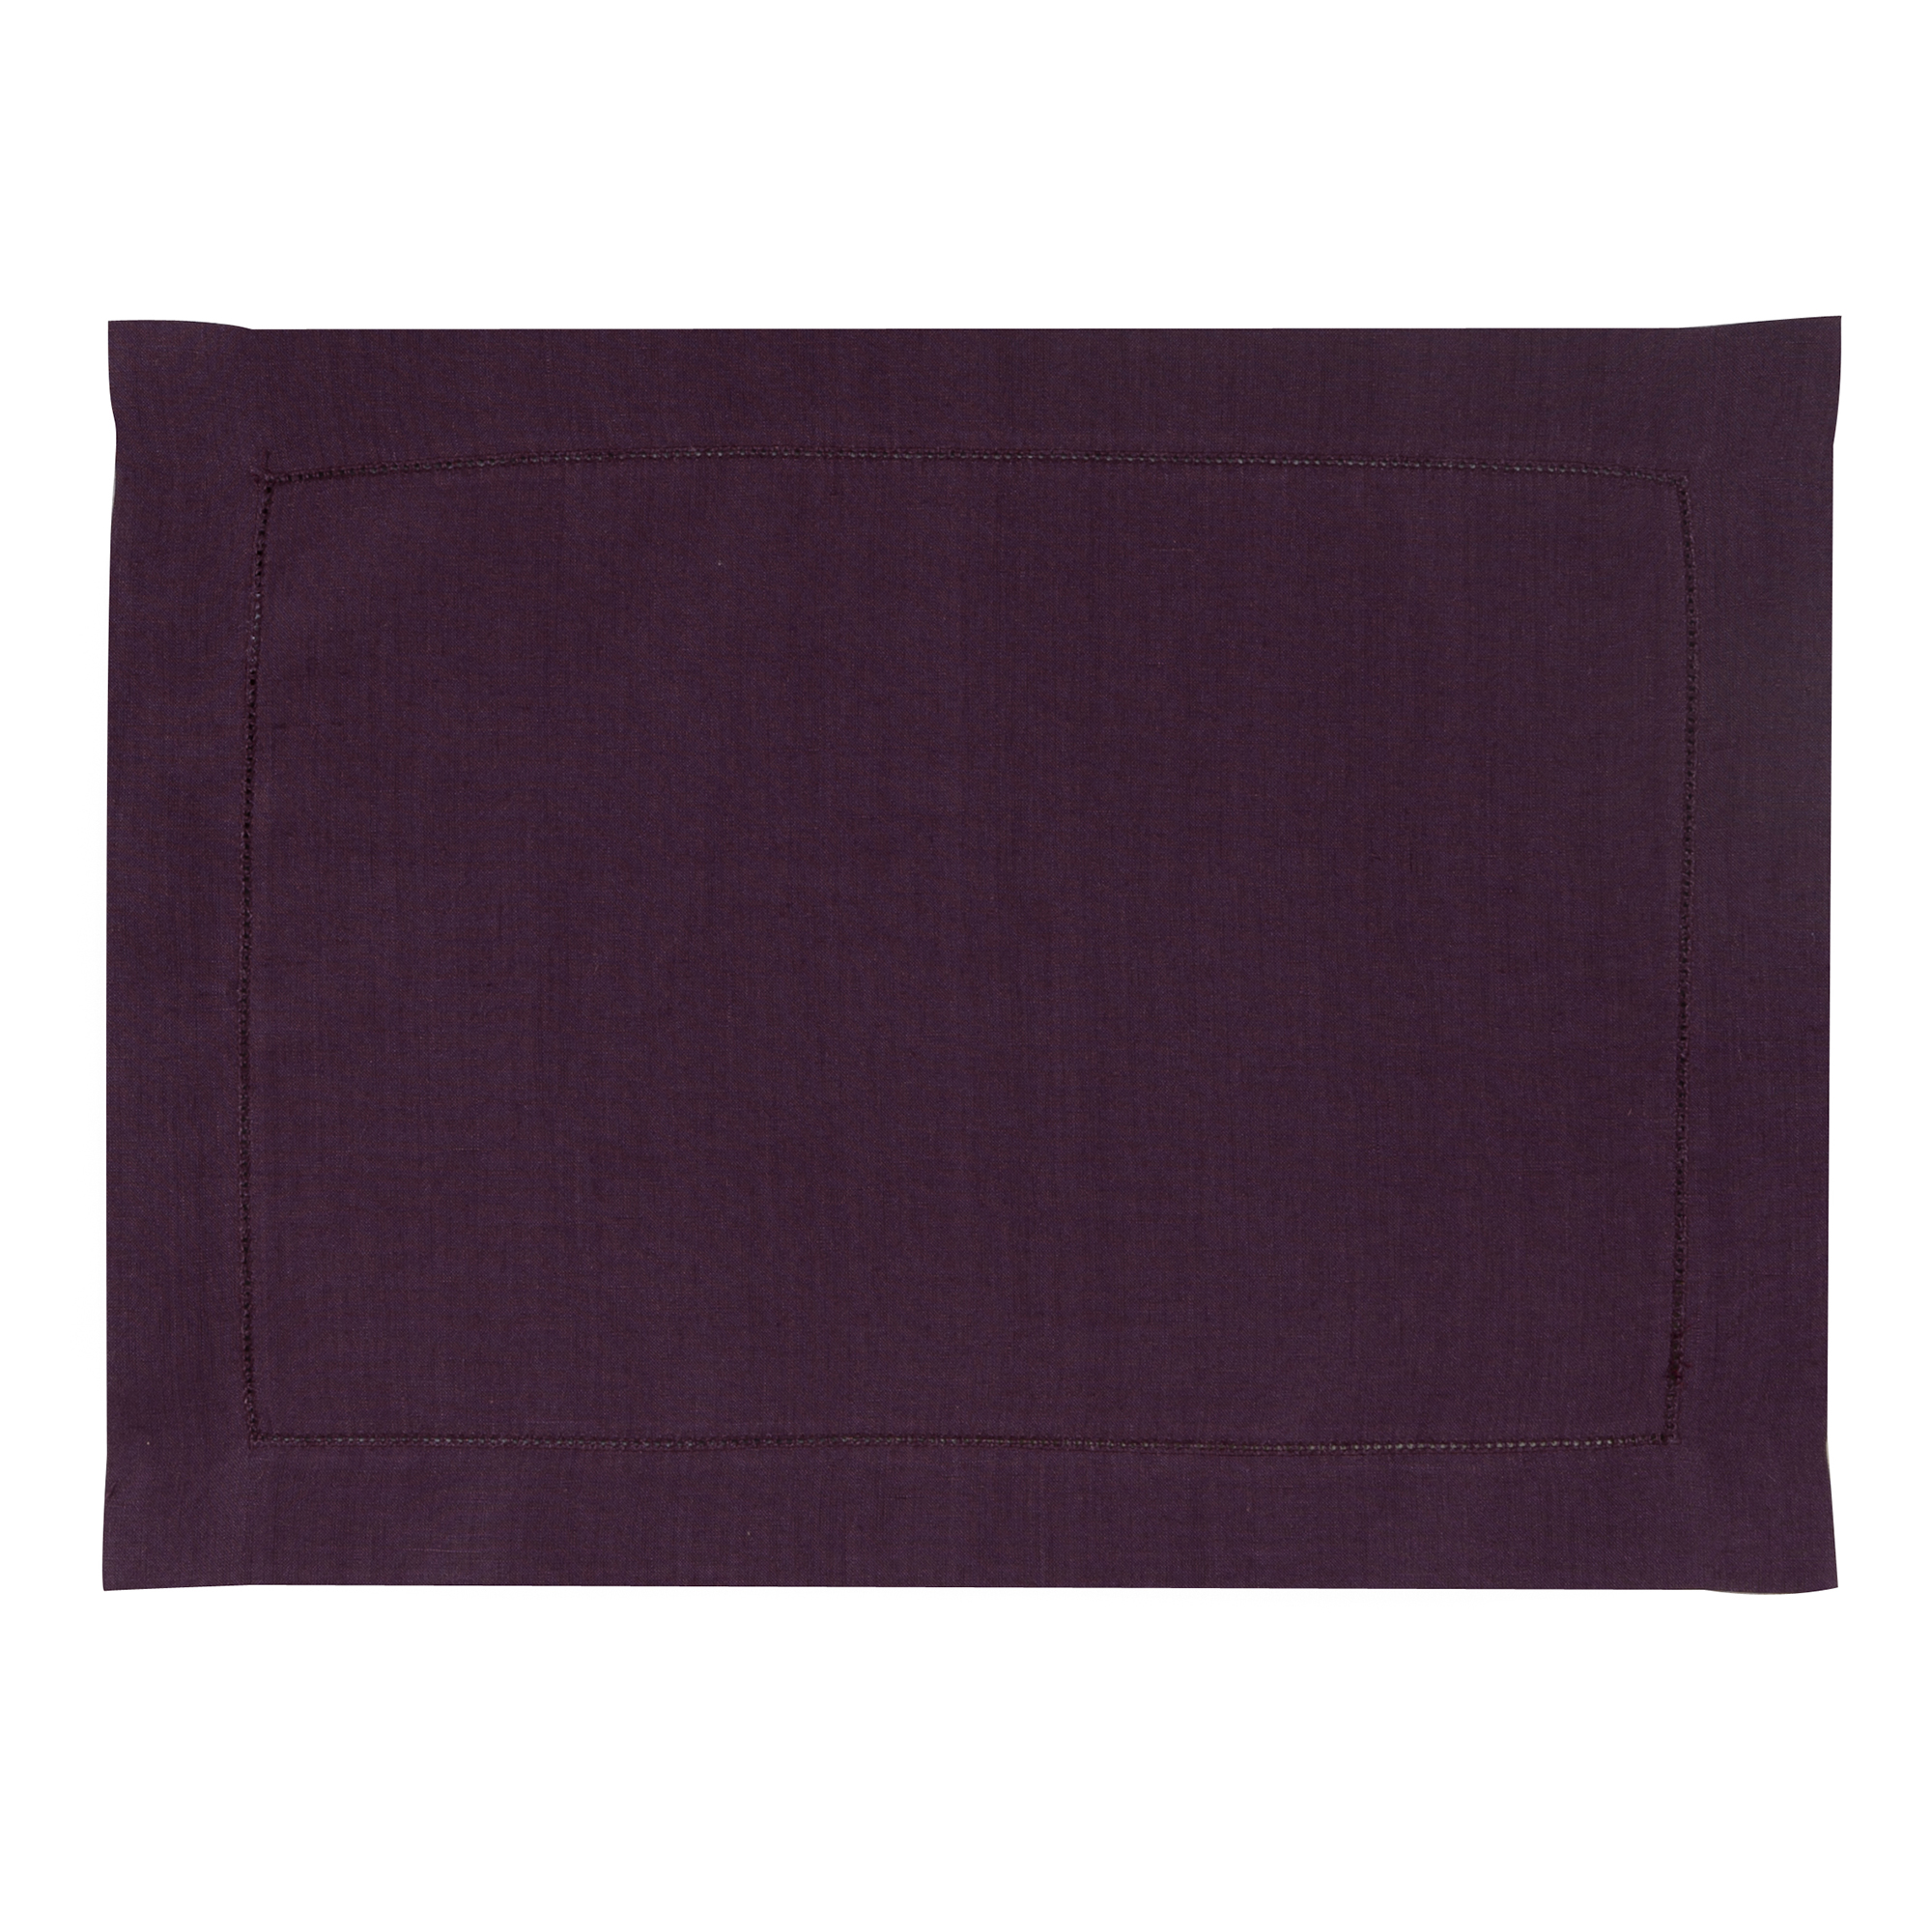 Set de table en lin violet 37x50